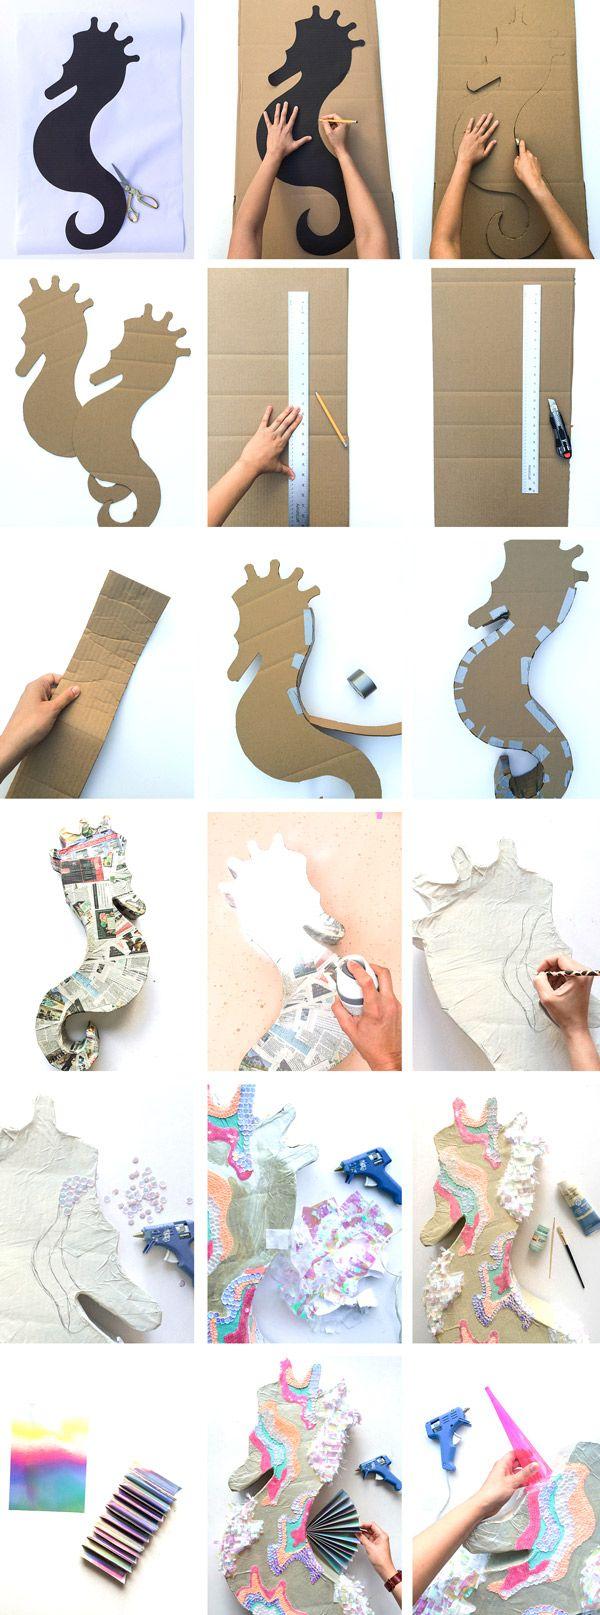 best images about craft ideas on pinterest crafts corner